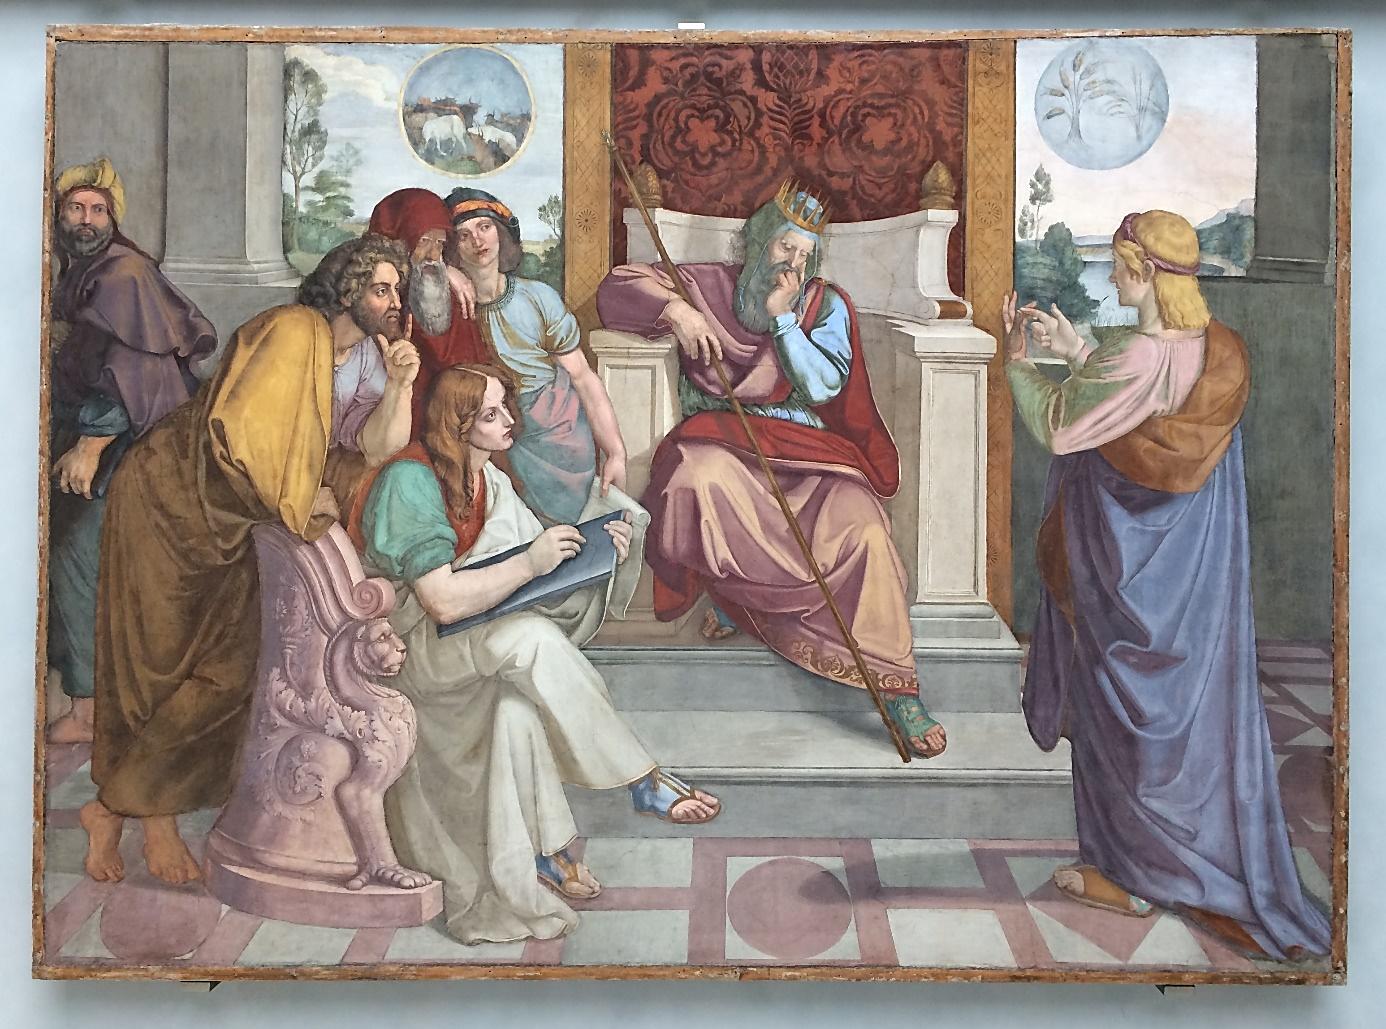 Casa Bartholdy Frescoes, Philipp Veit,  The Seven Years of Plenty  (1817), Peter von Cornelius,  Joseph Interprets Pharoah's Dream  (1817), Old National Gallery, Berlin